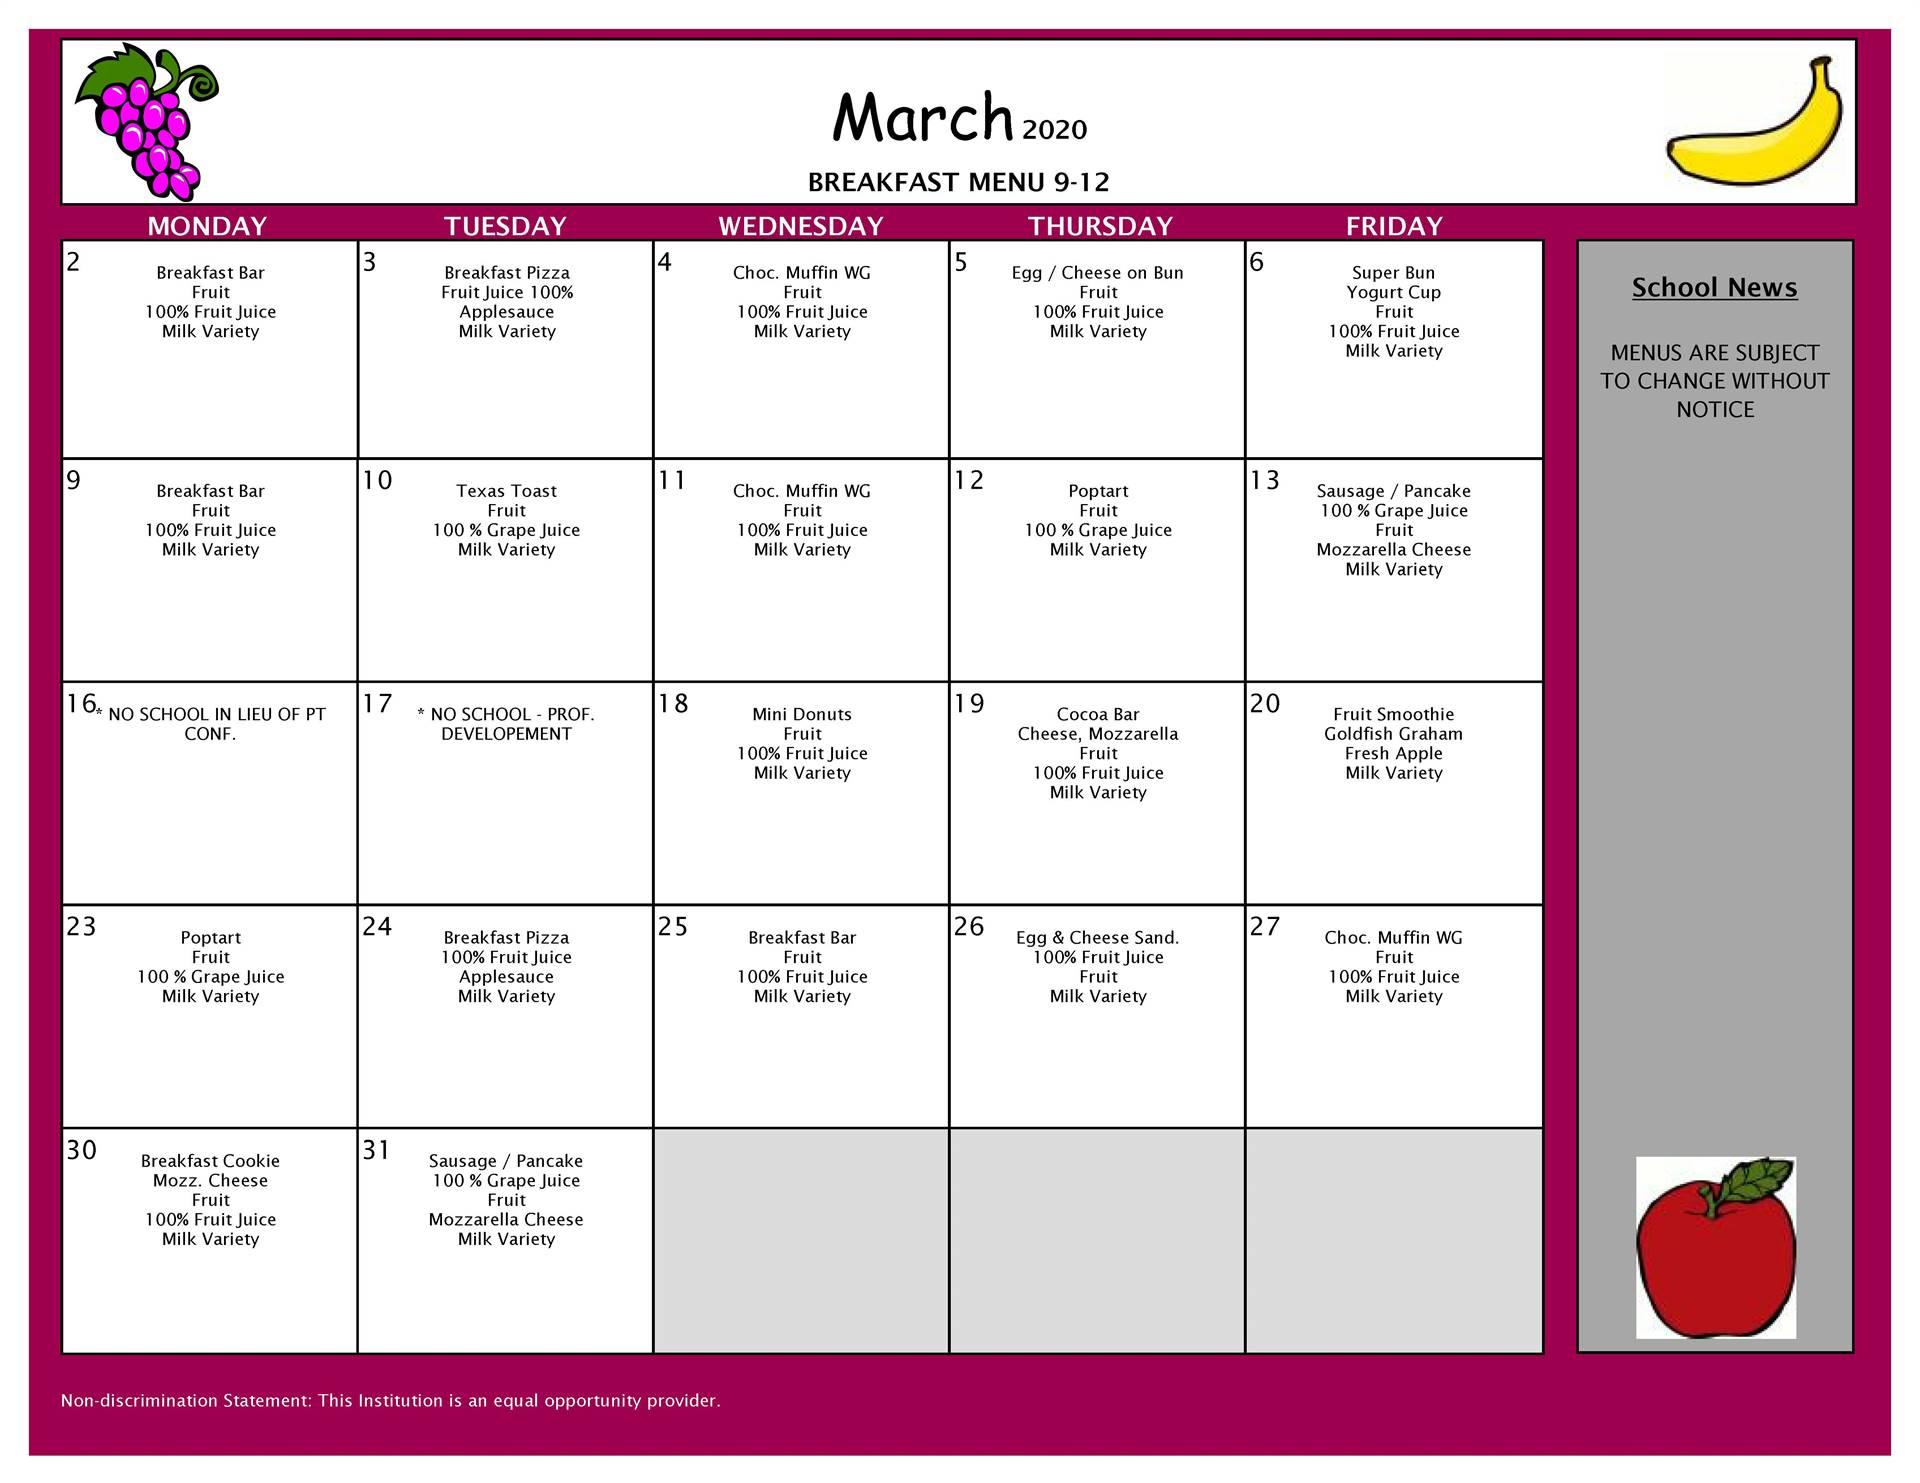 March Breakfast Grades 9-12